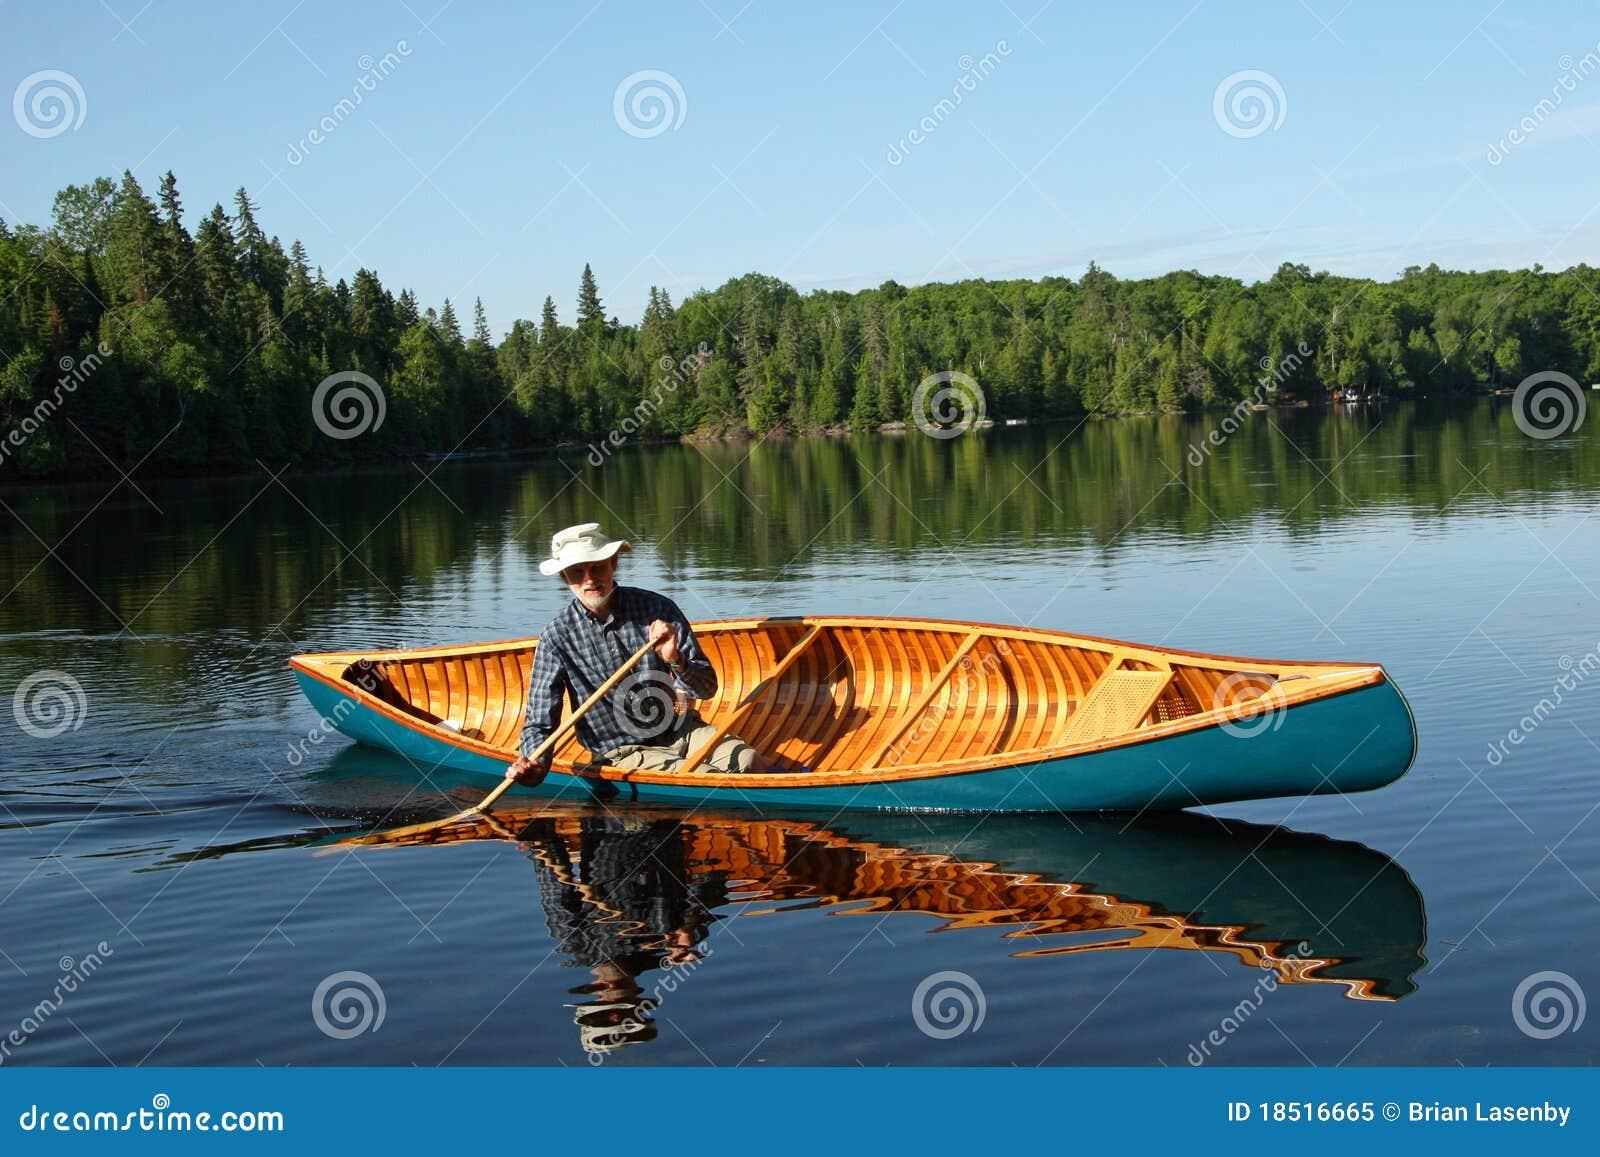 Canoeist - Northern Ontario. Canada